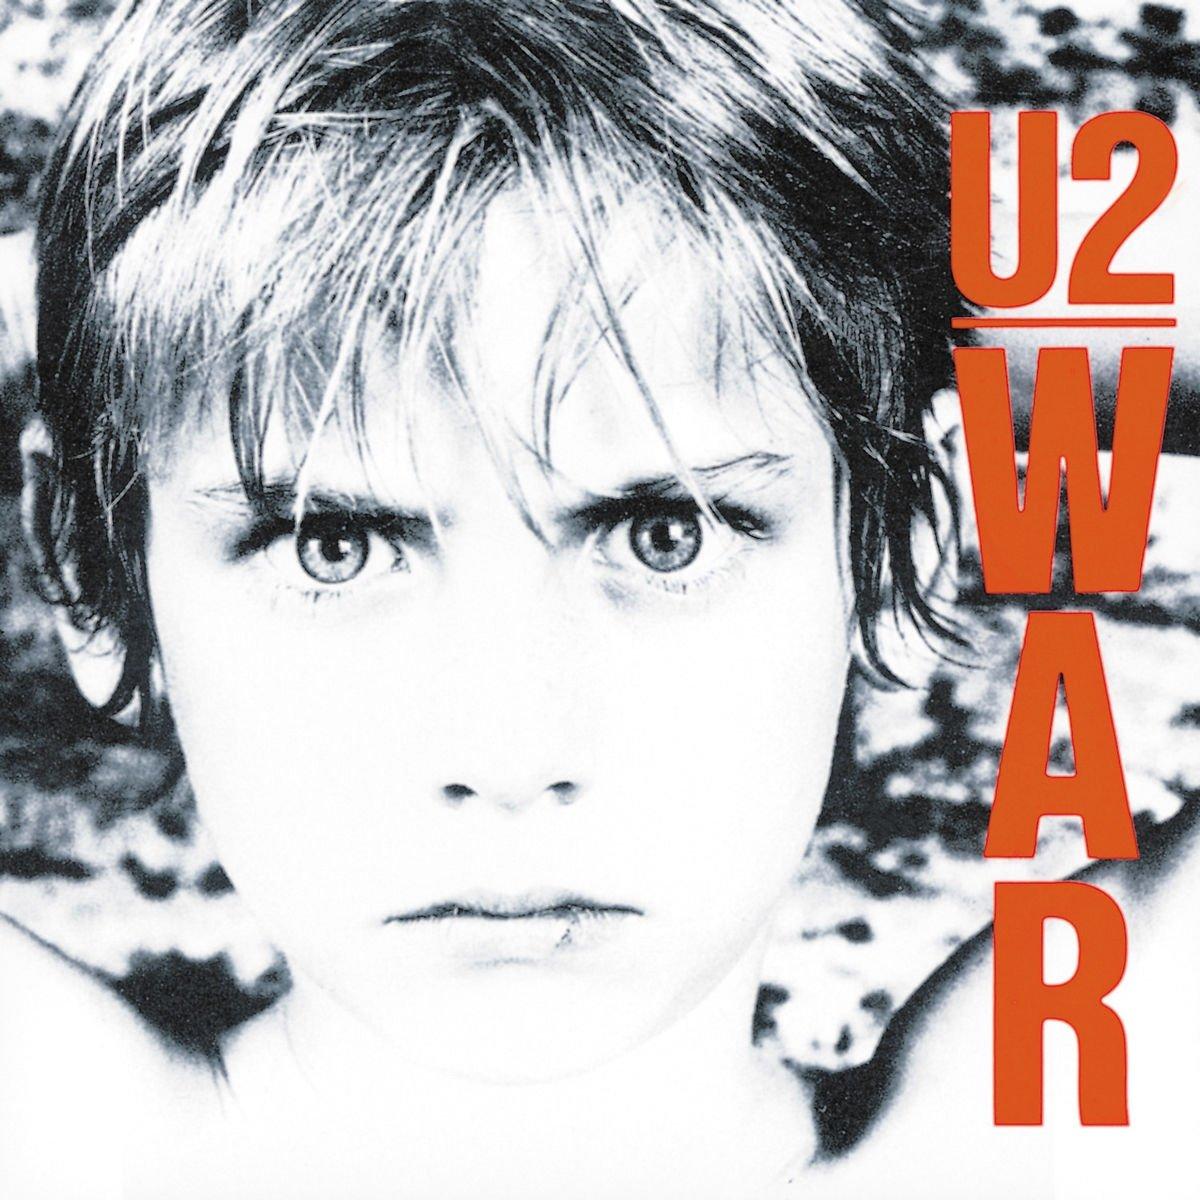 War [Vinyl] by Island